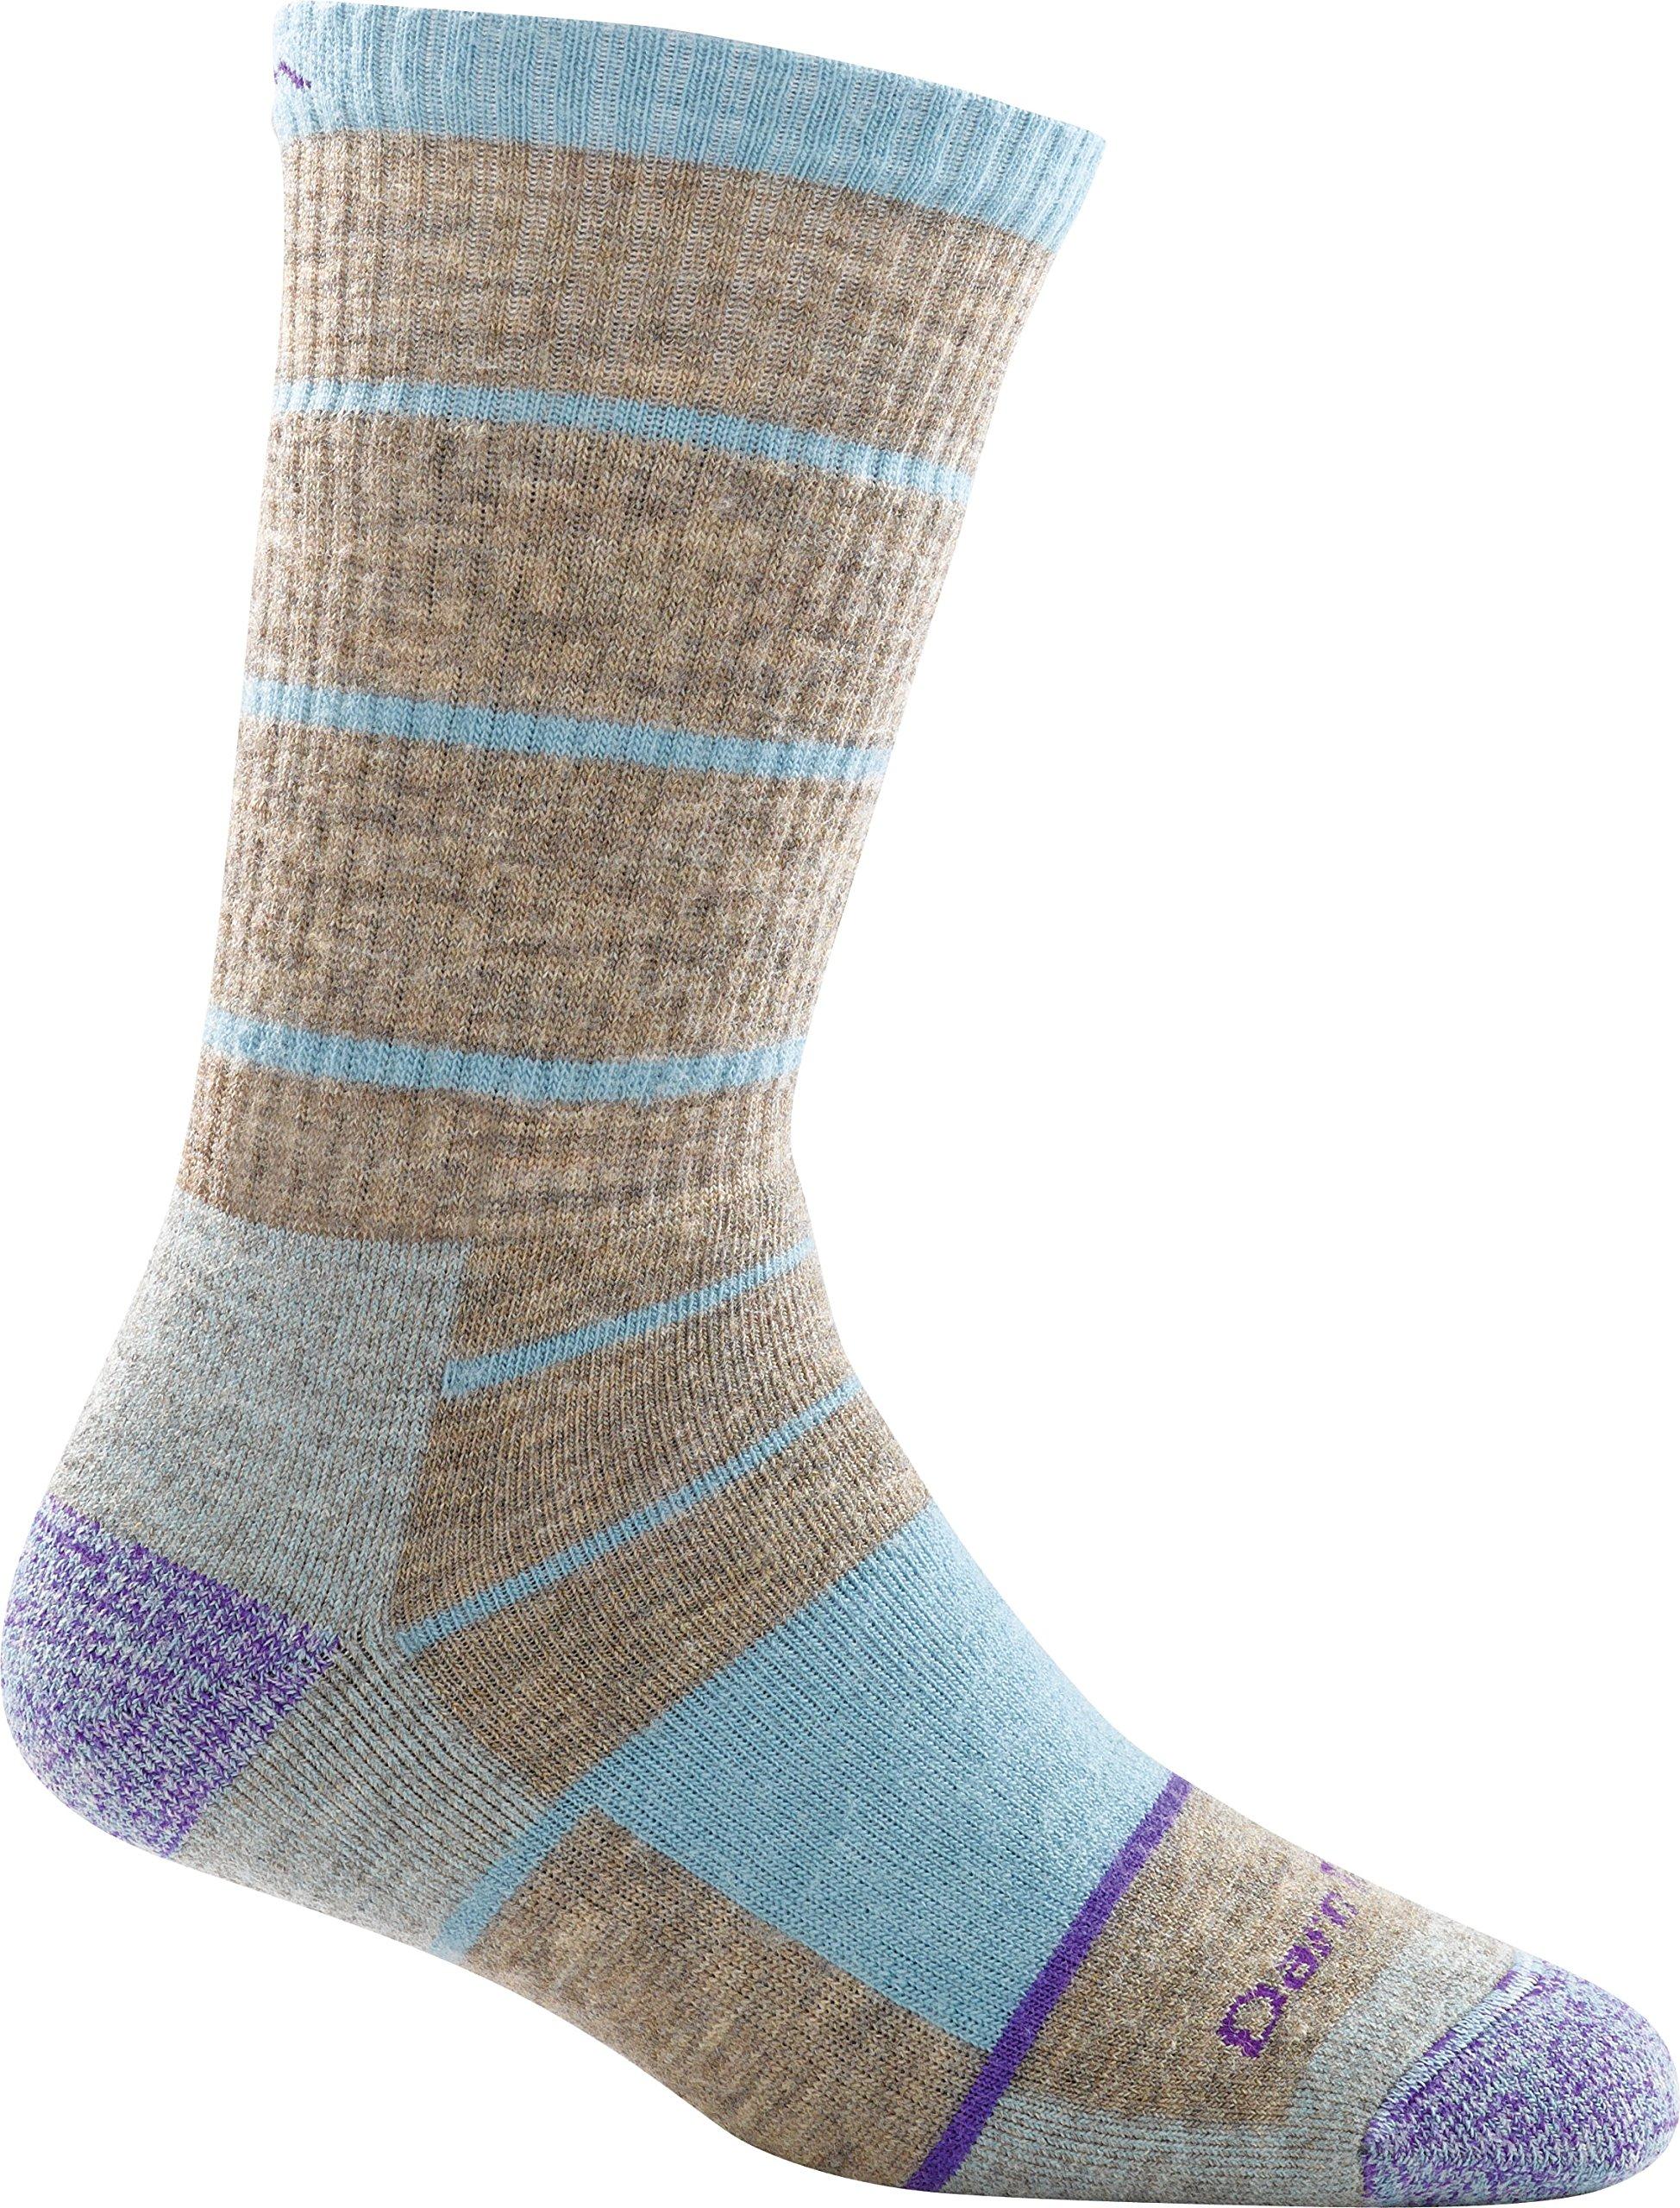 Darn Tough Summit Stripe Full Cushion Boot Sock - Women's Pebbles Large DISCONTINUED